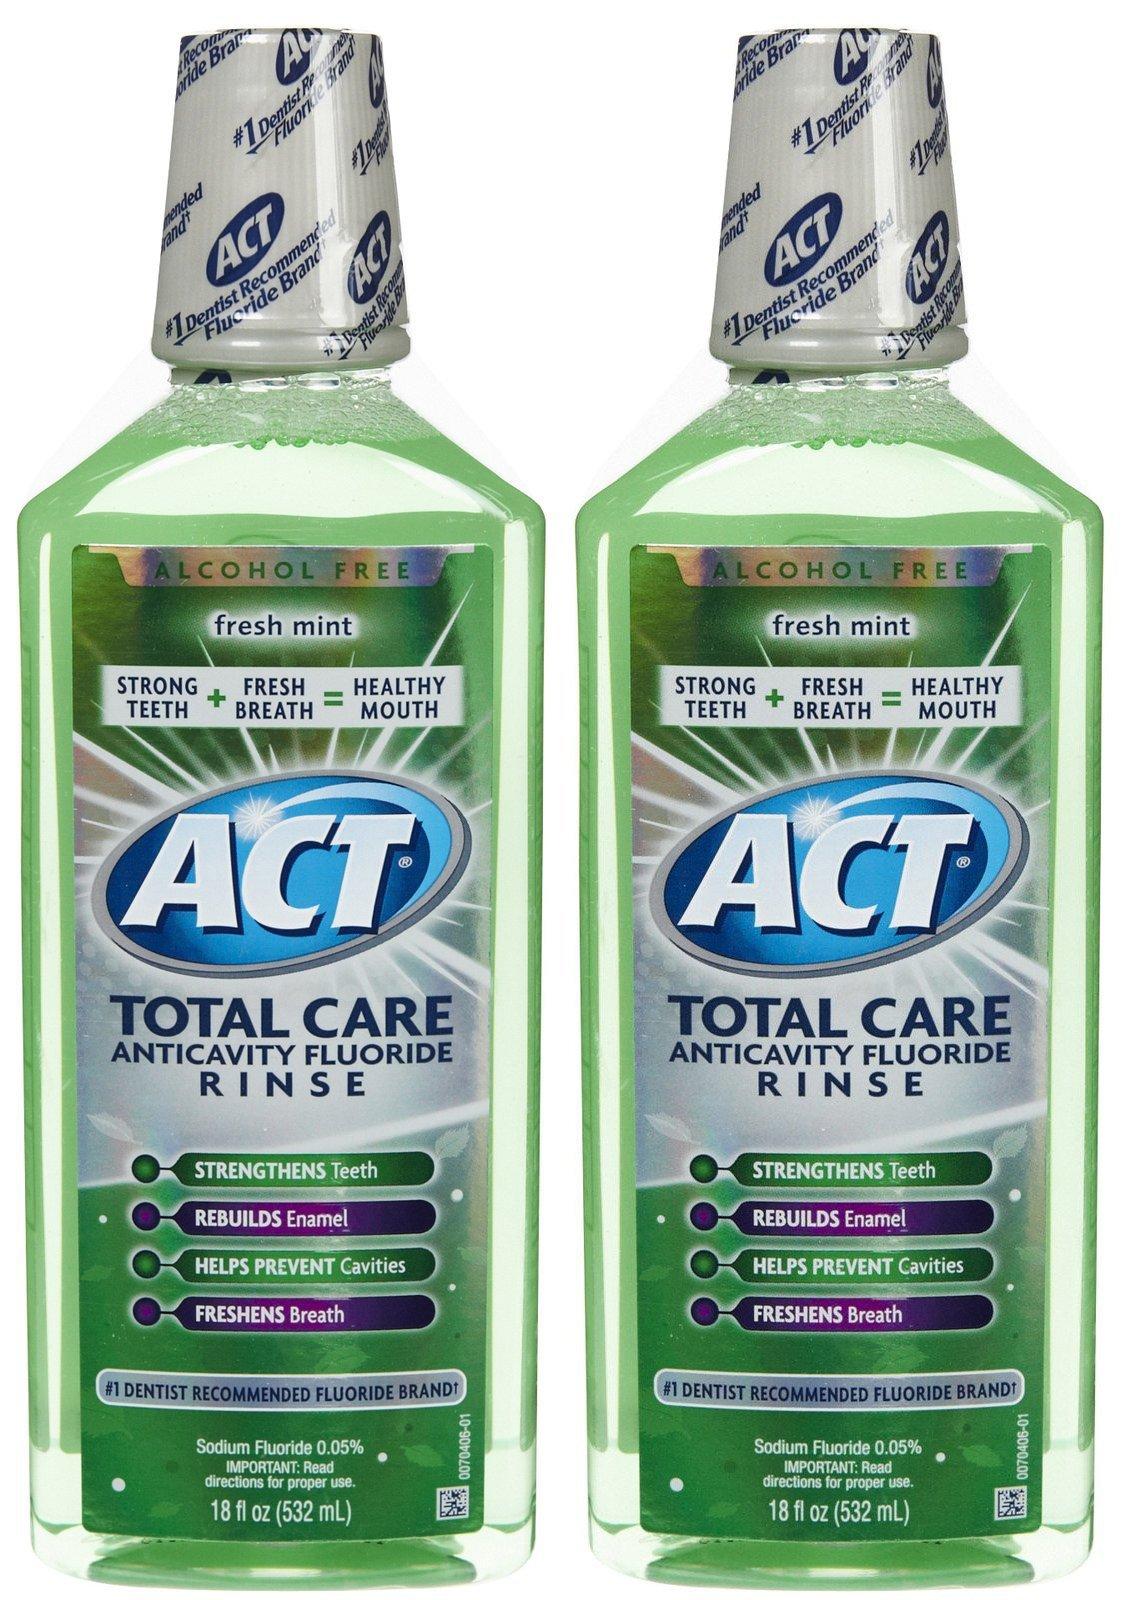 ACT Total Care Anticavity Fluoride Mouthwash-Fresh Mint-18 oz, 2 pk